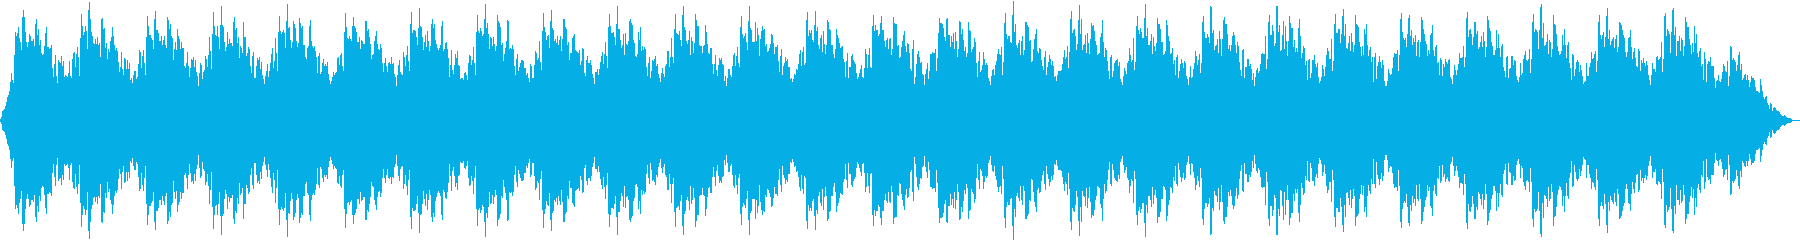 魔法詠唱、魔法発動、独白 09の再生済みの波形